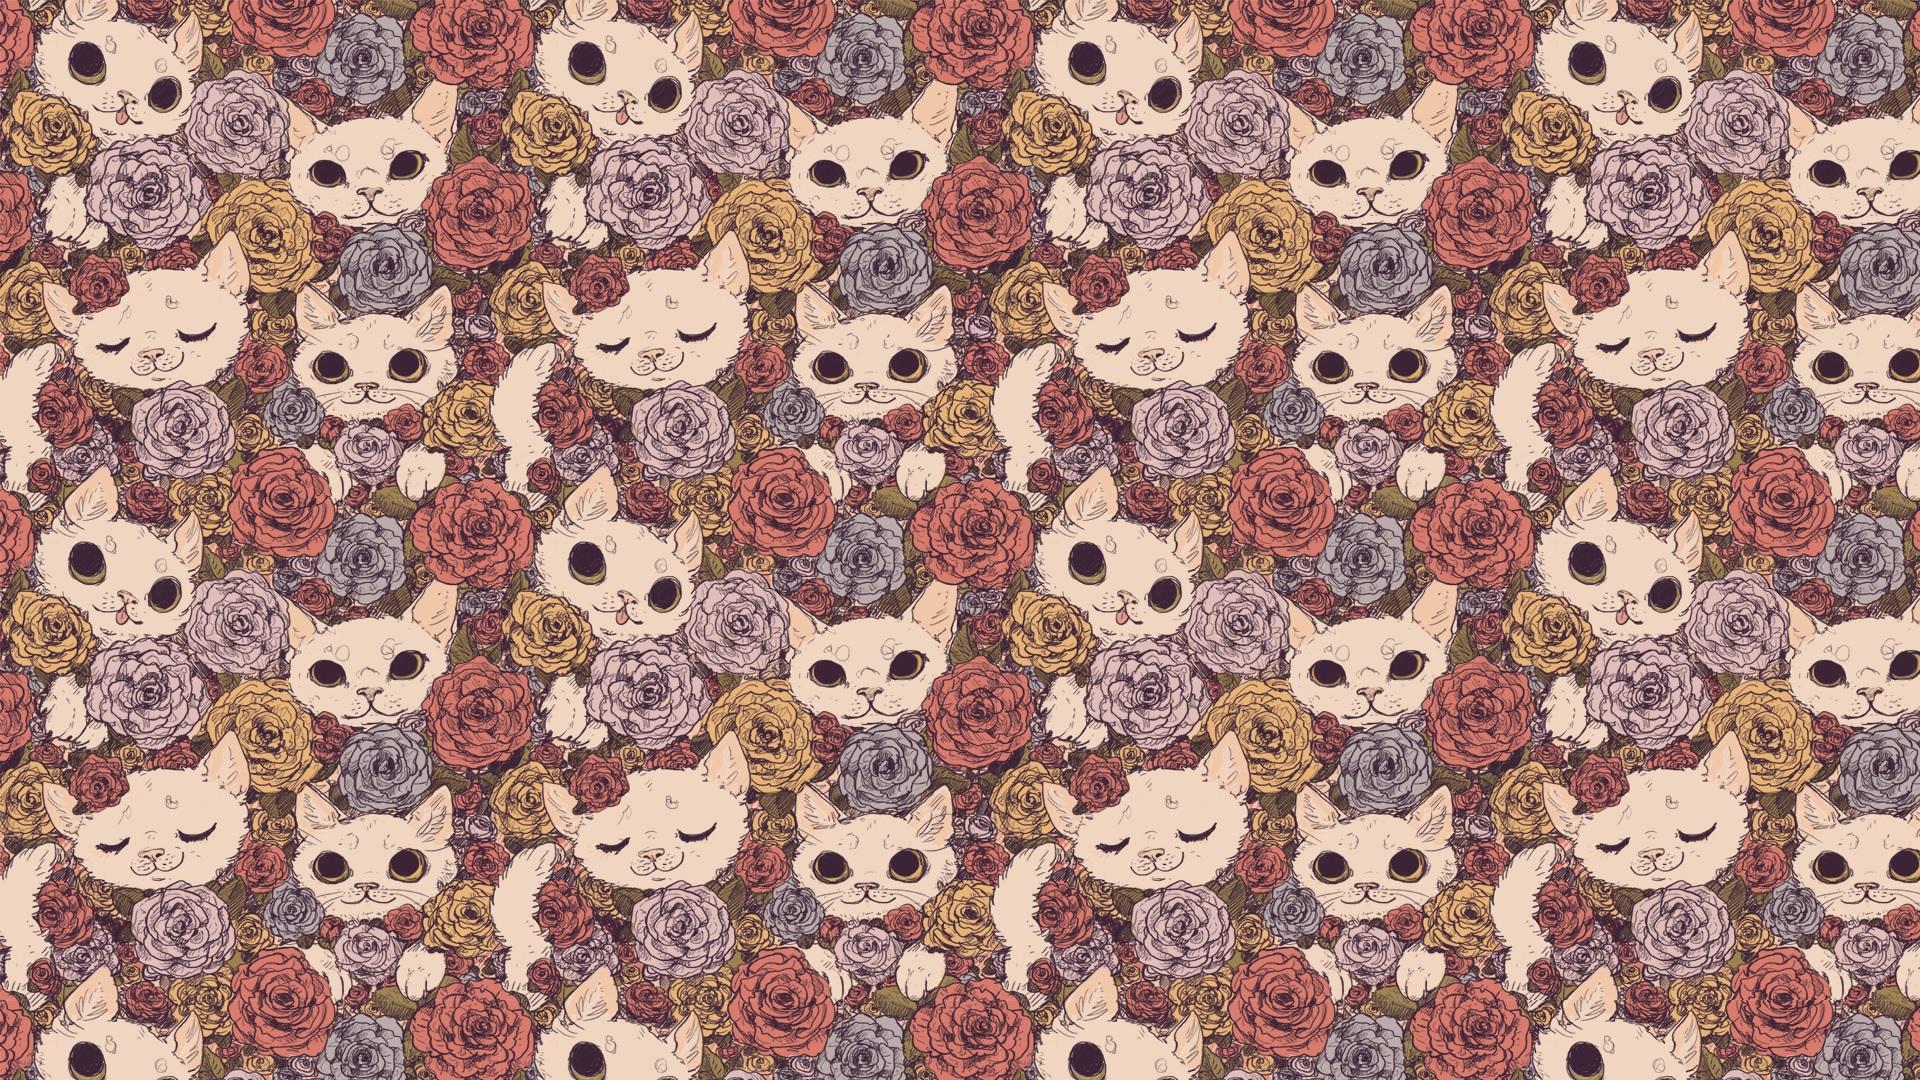 1920×1080-wallpaper-wpc580533